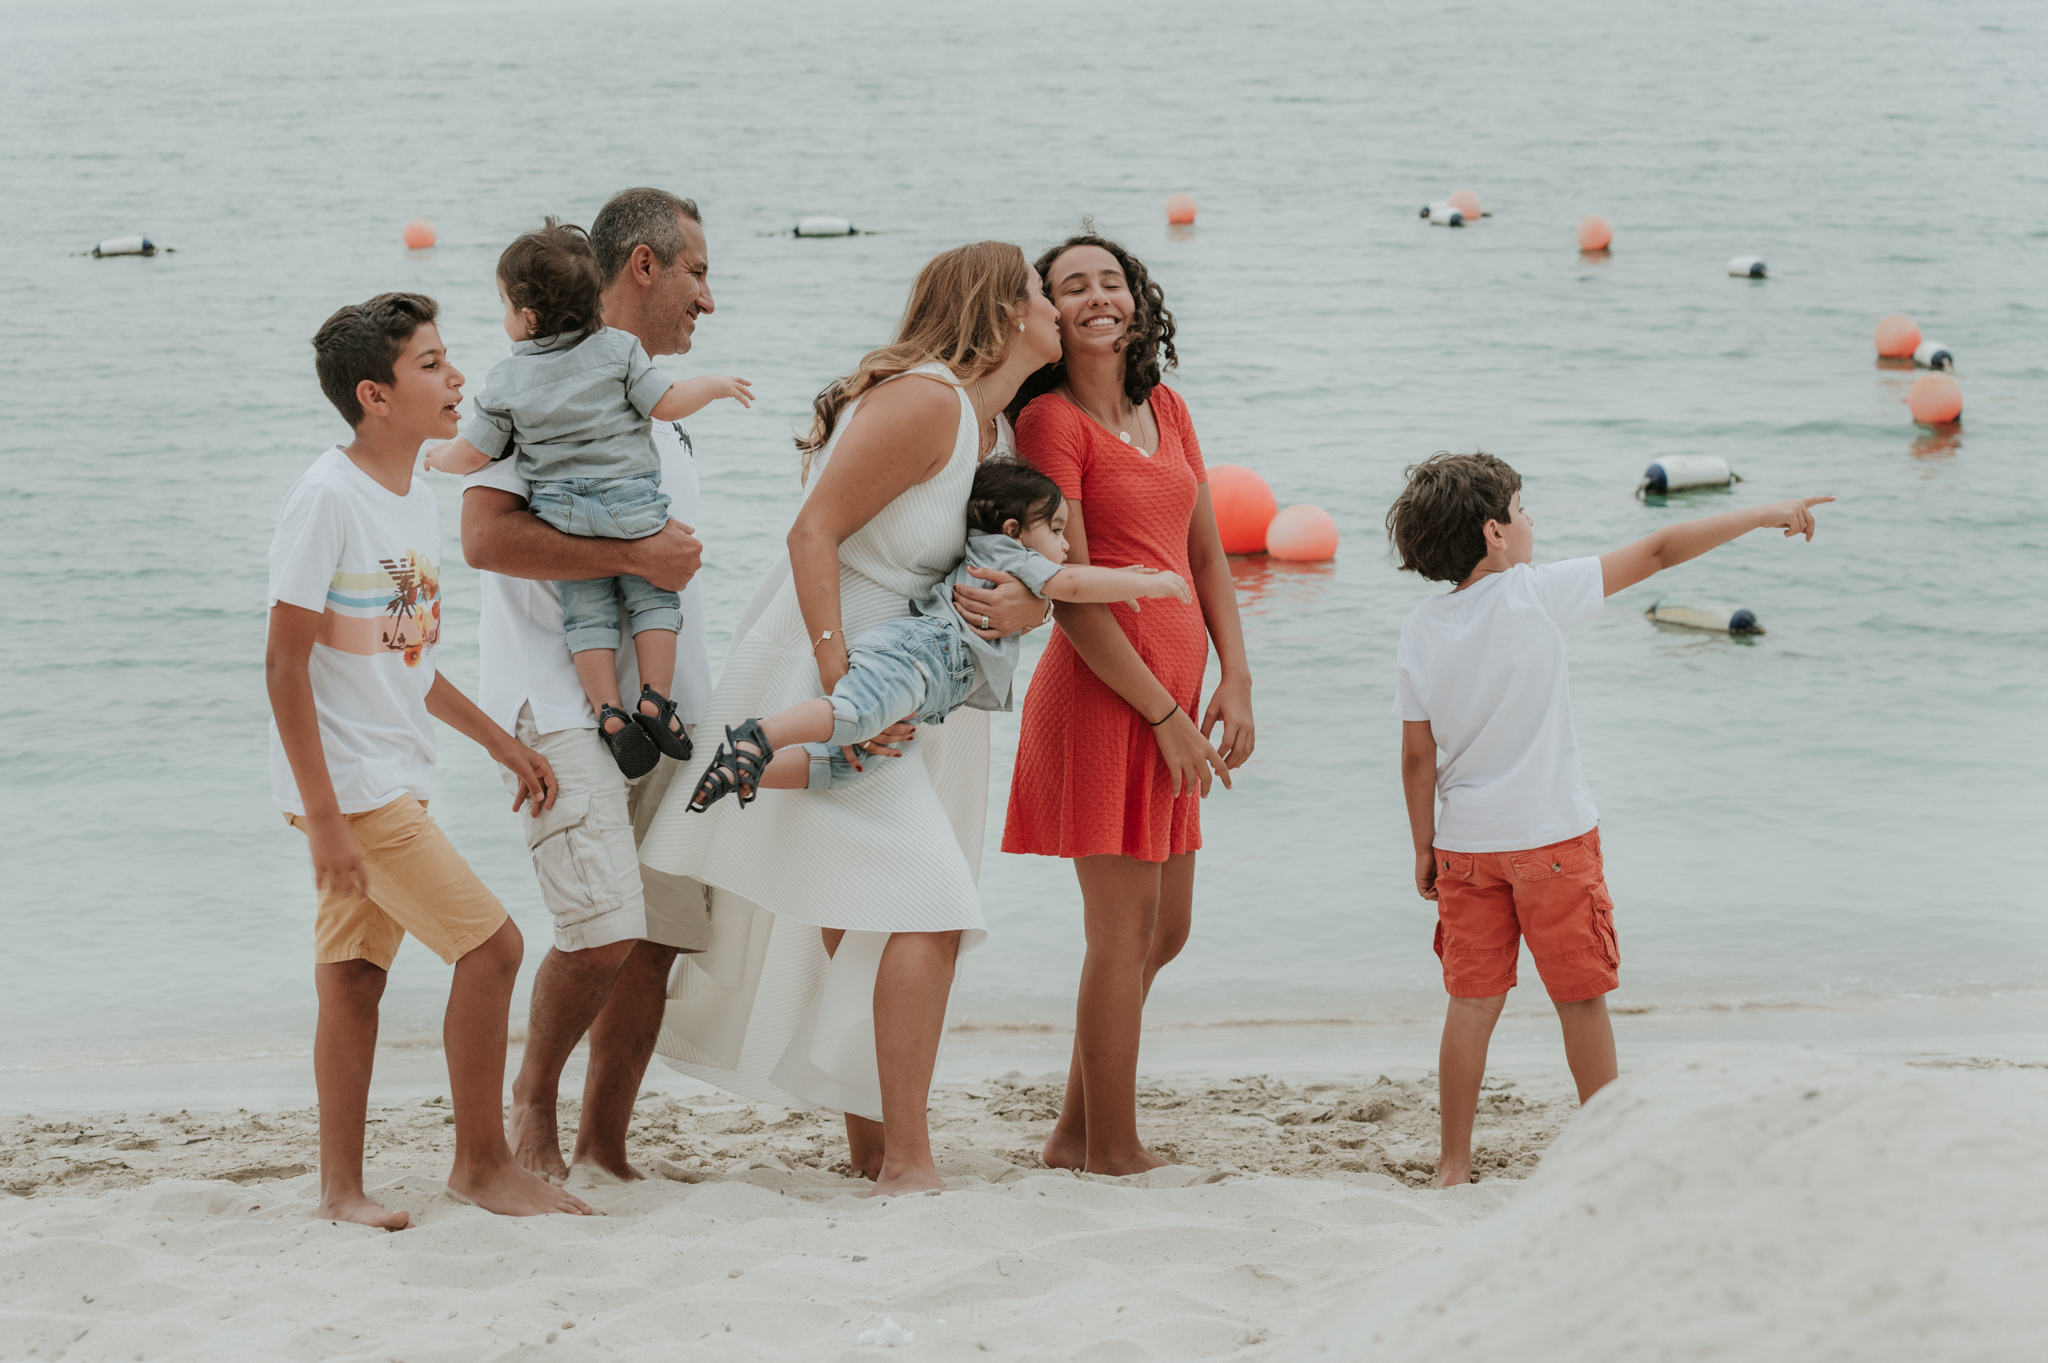 Lana Photographs Family Photographer Dubai Top Family Photographers family playing at the beach in Abu-Dhabi